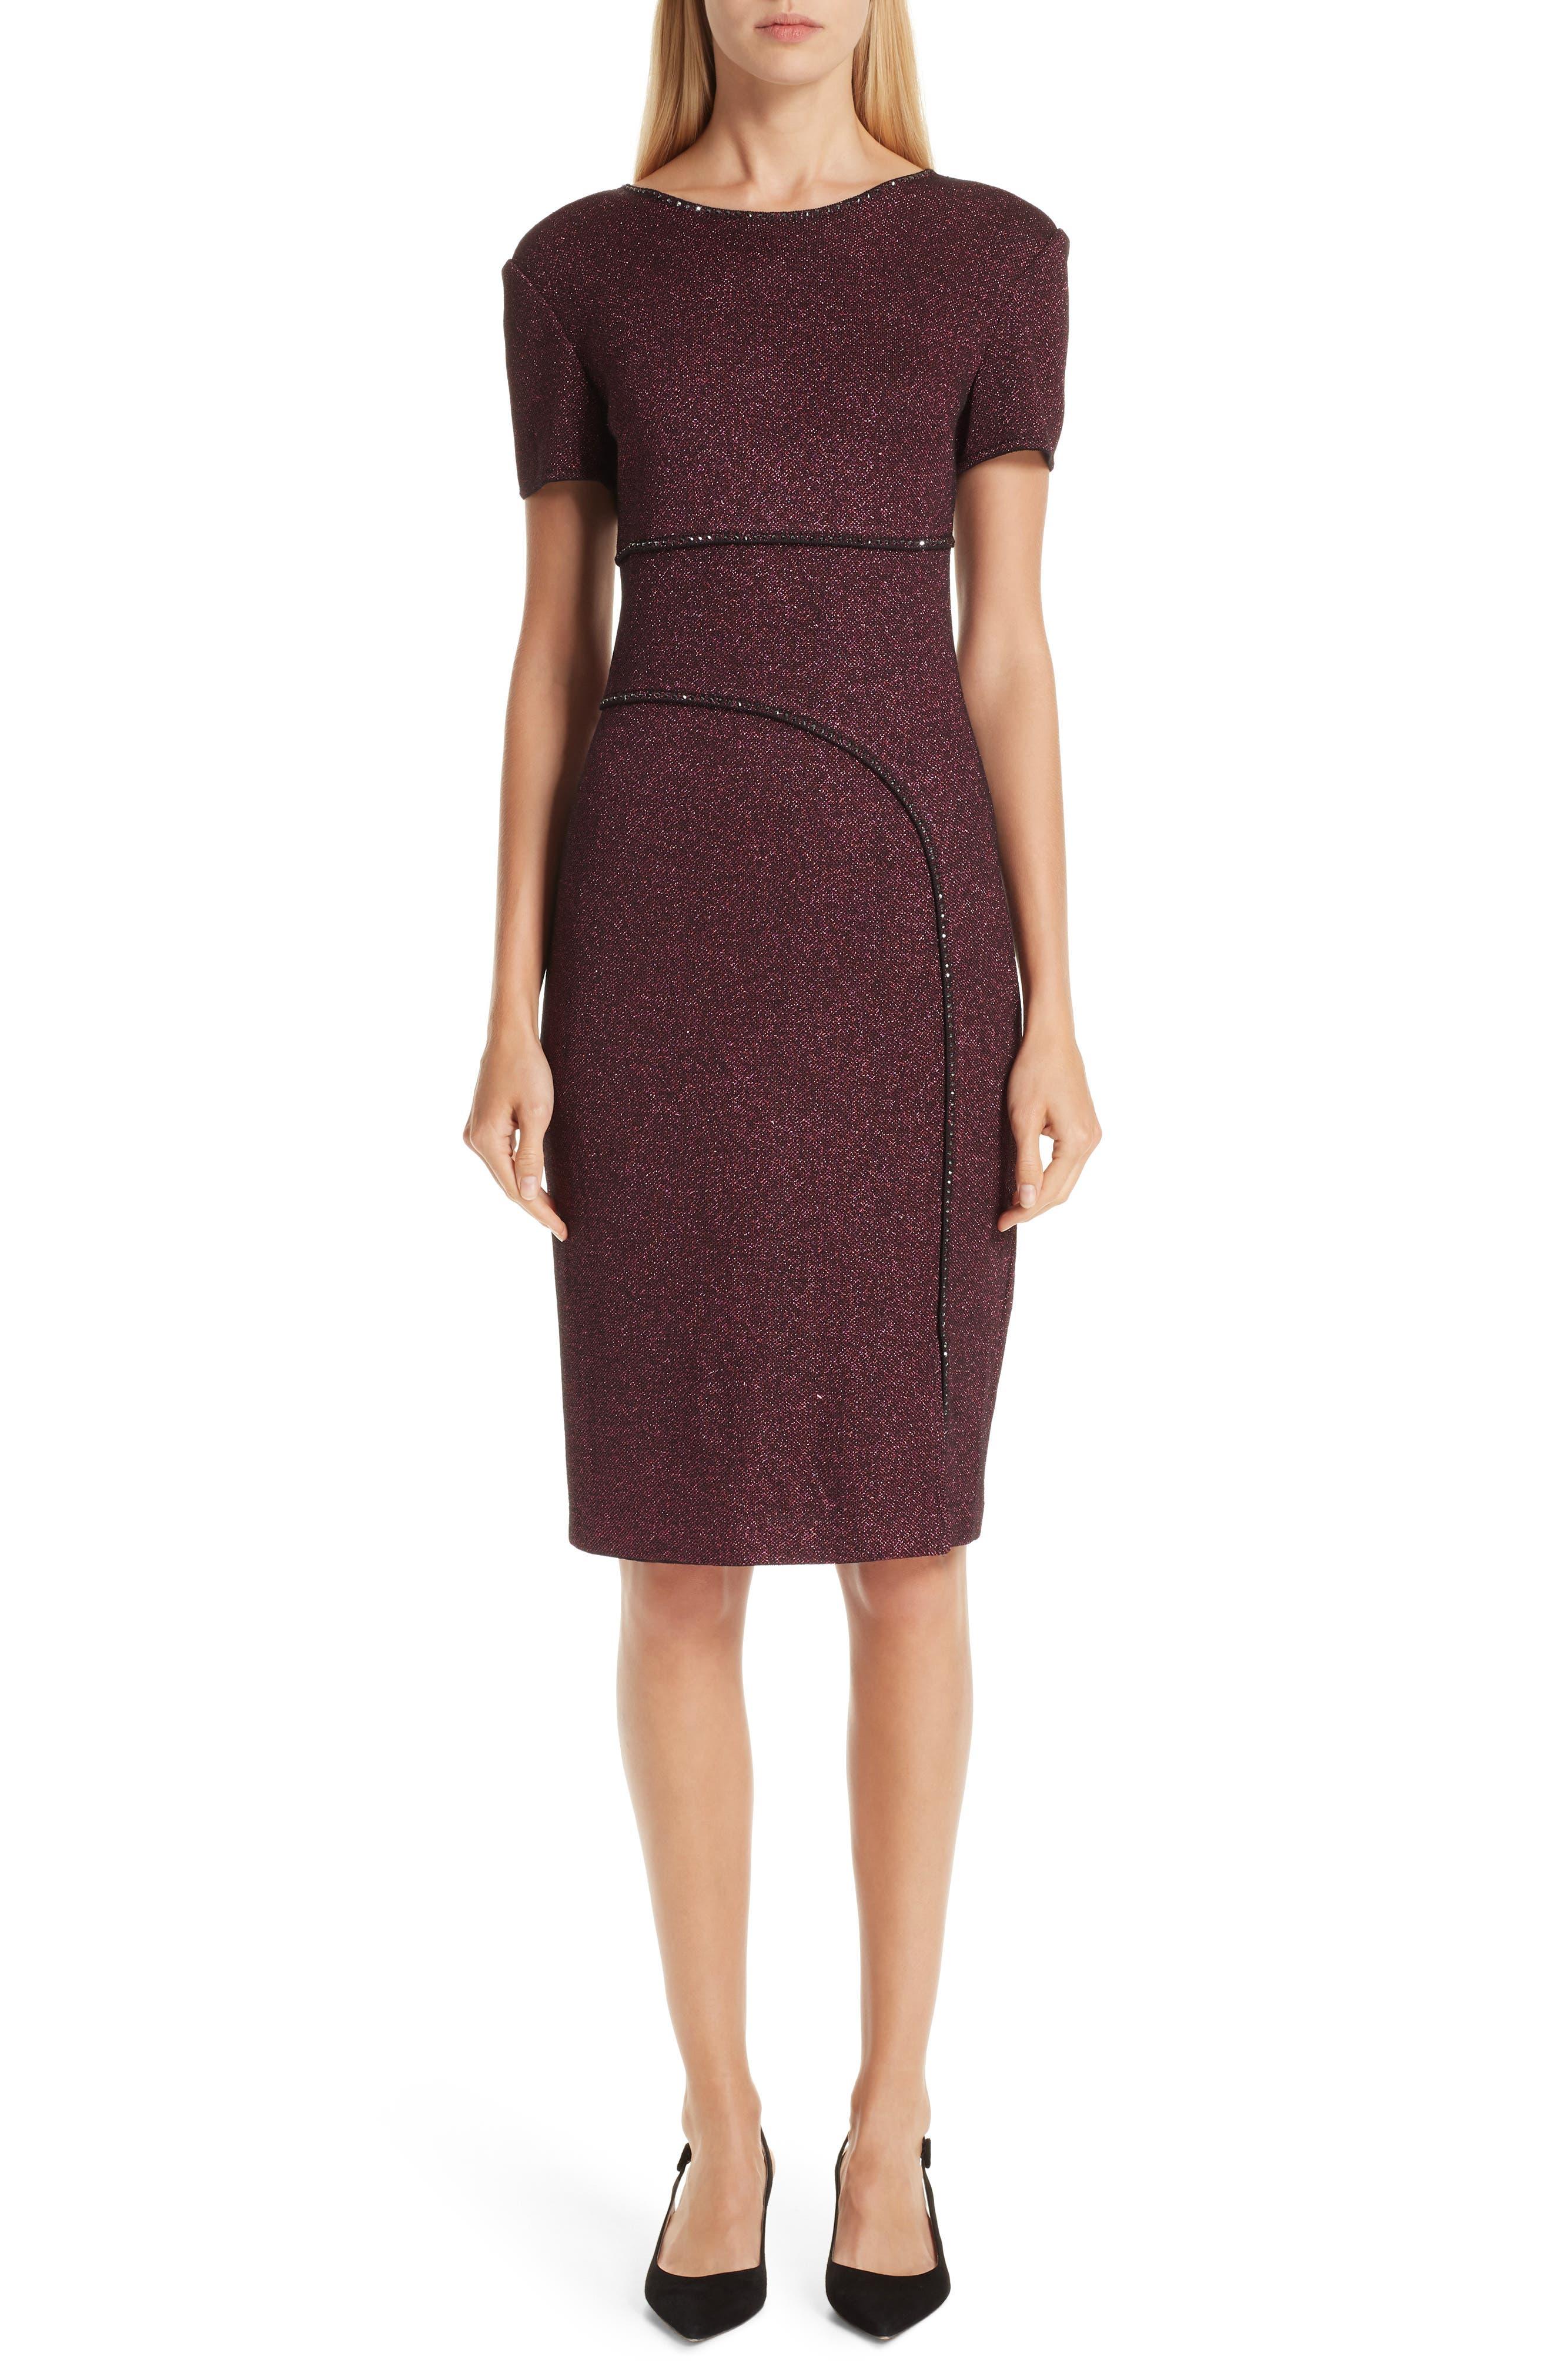 ST. JOHN COLLECTION Mod Metallic Knit Sheath Dress, Main, color, DARK PINK MULTI